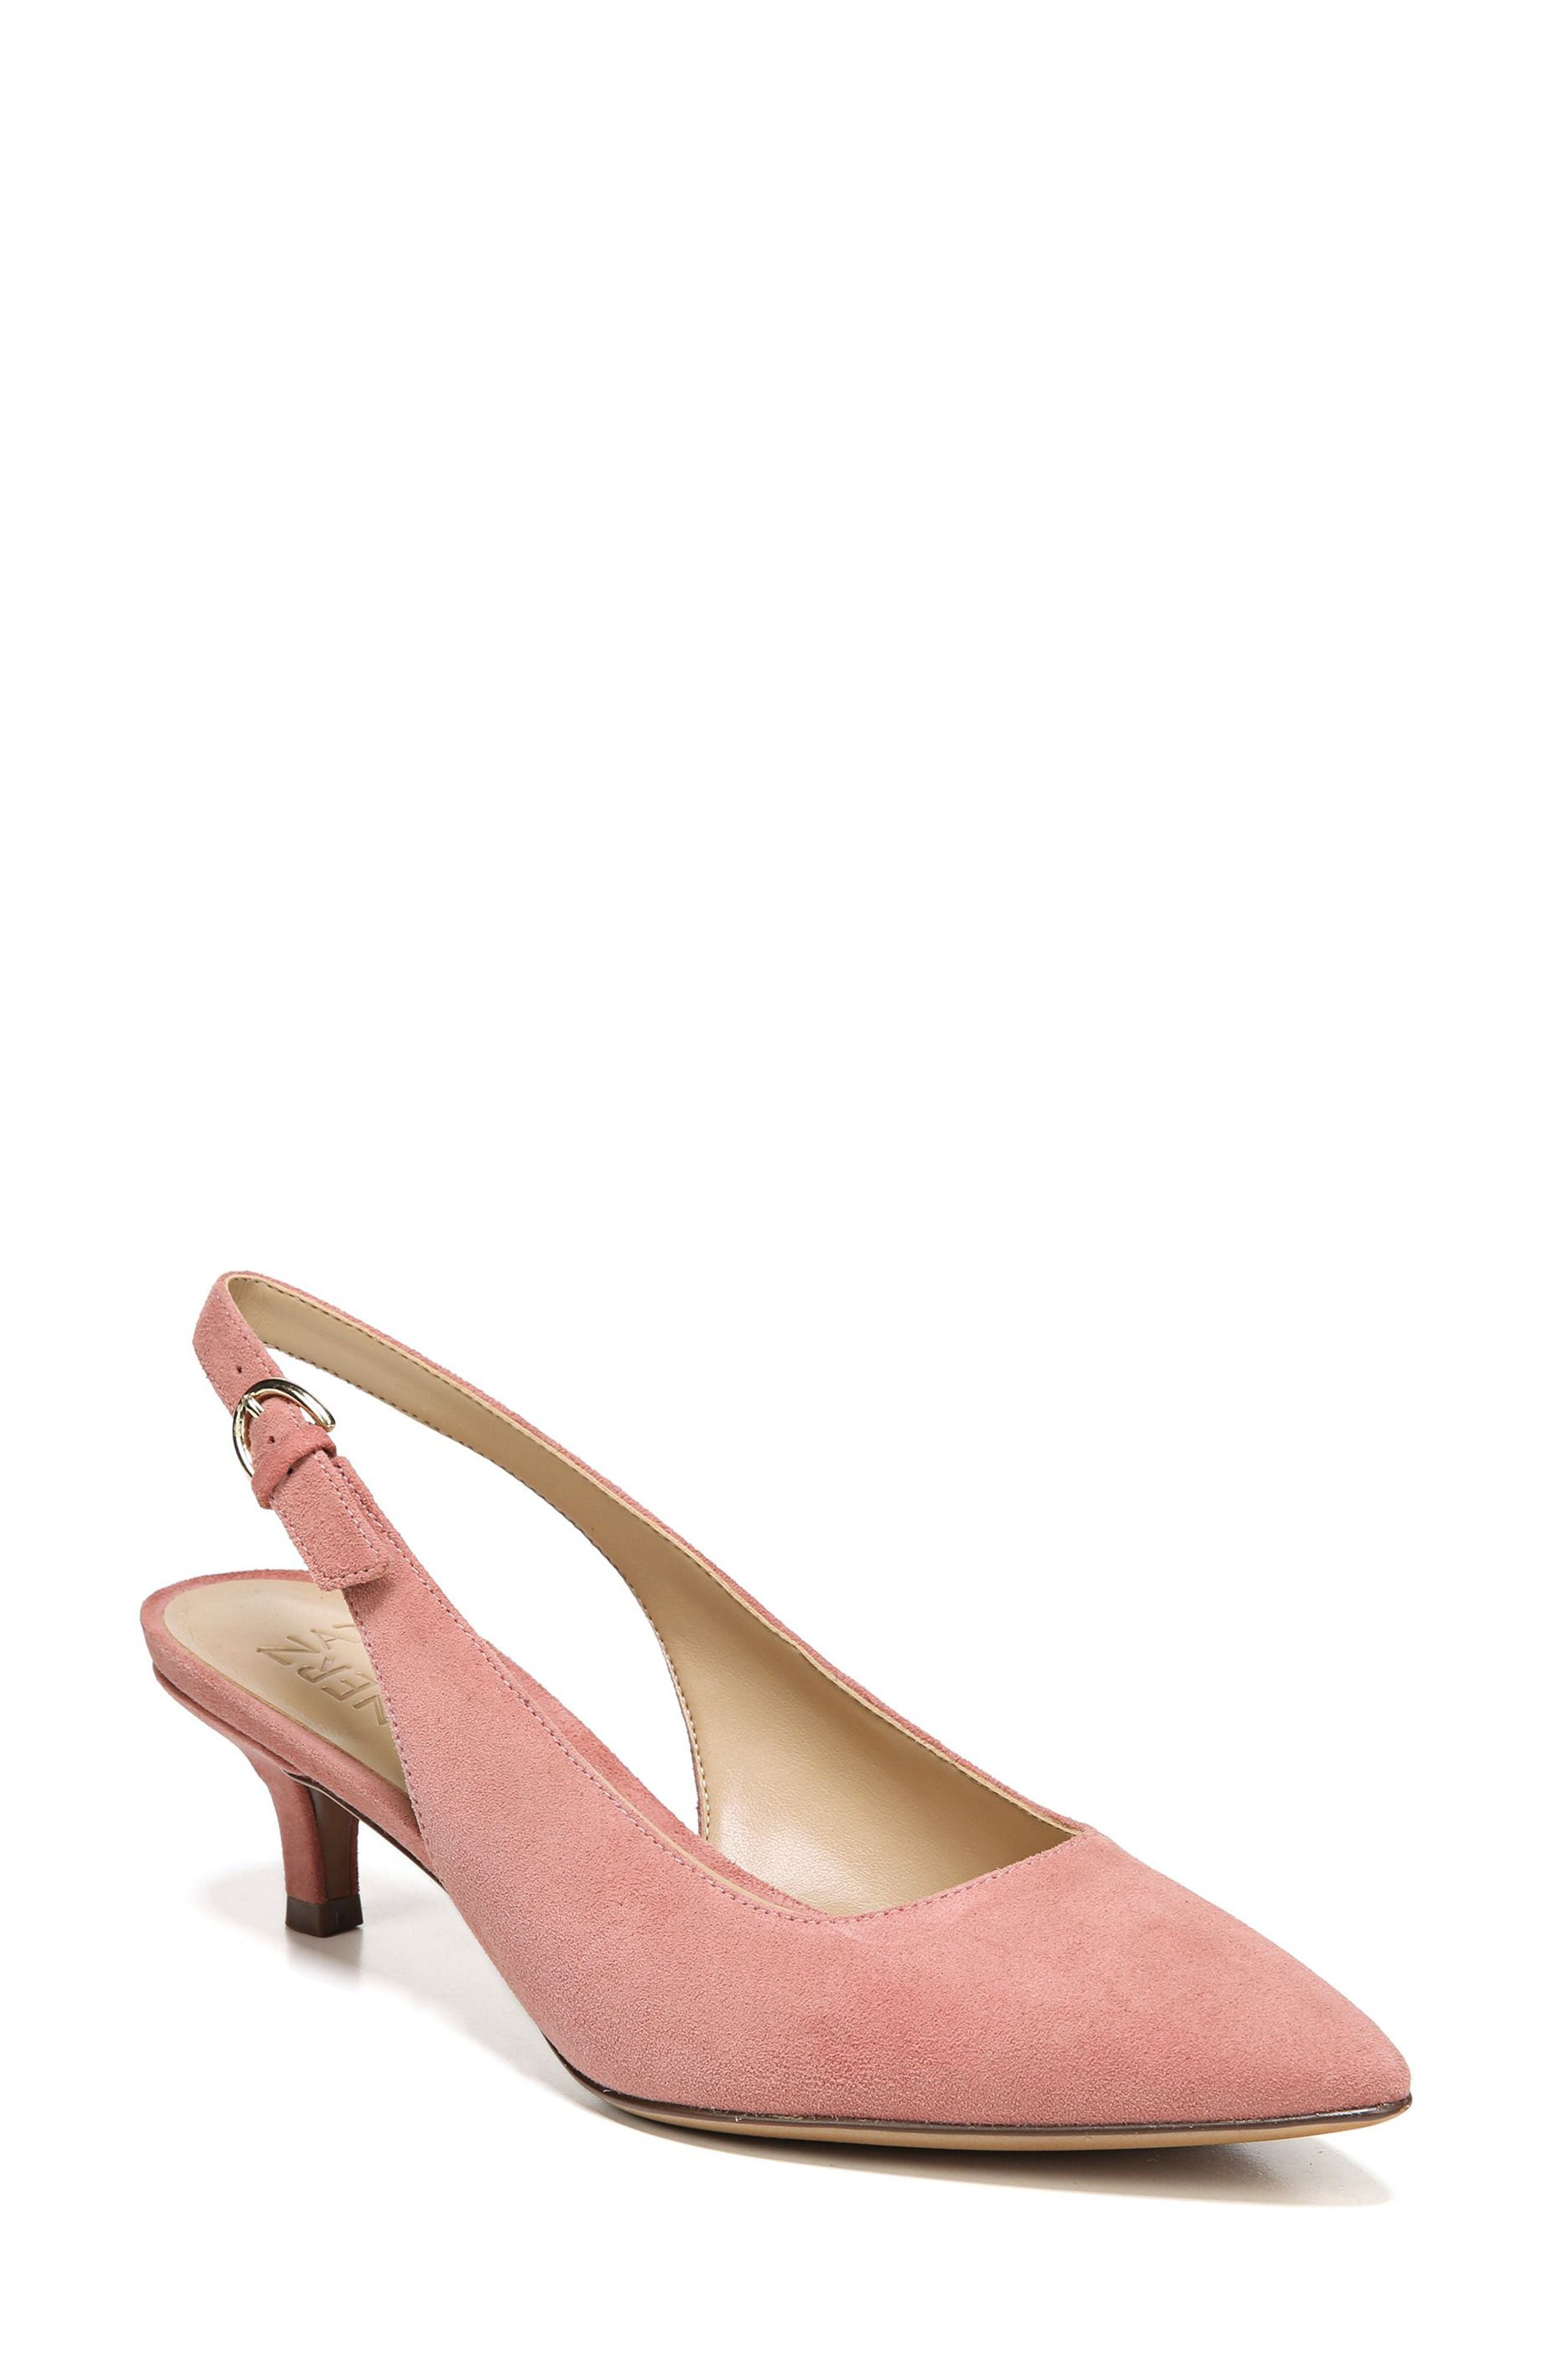 Peyton Slingback Pump,                         Main,                         color, Pink Leather